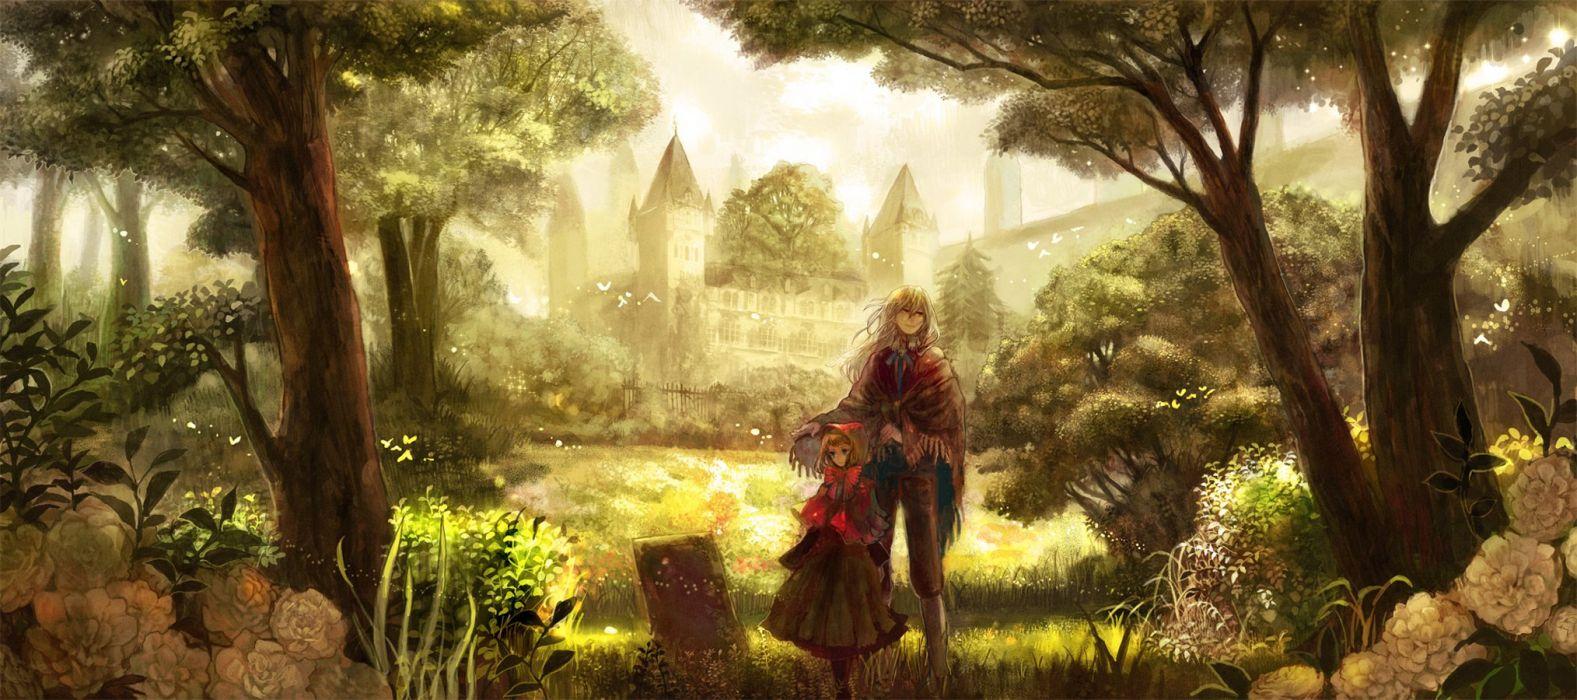 anime fantasy dress landscape wallpaper